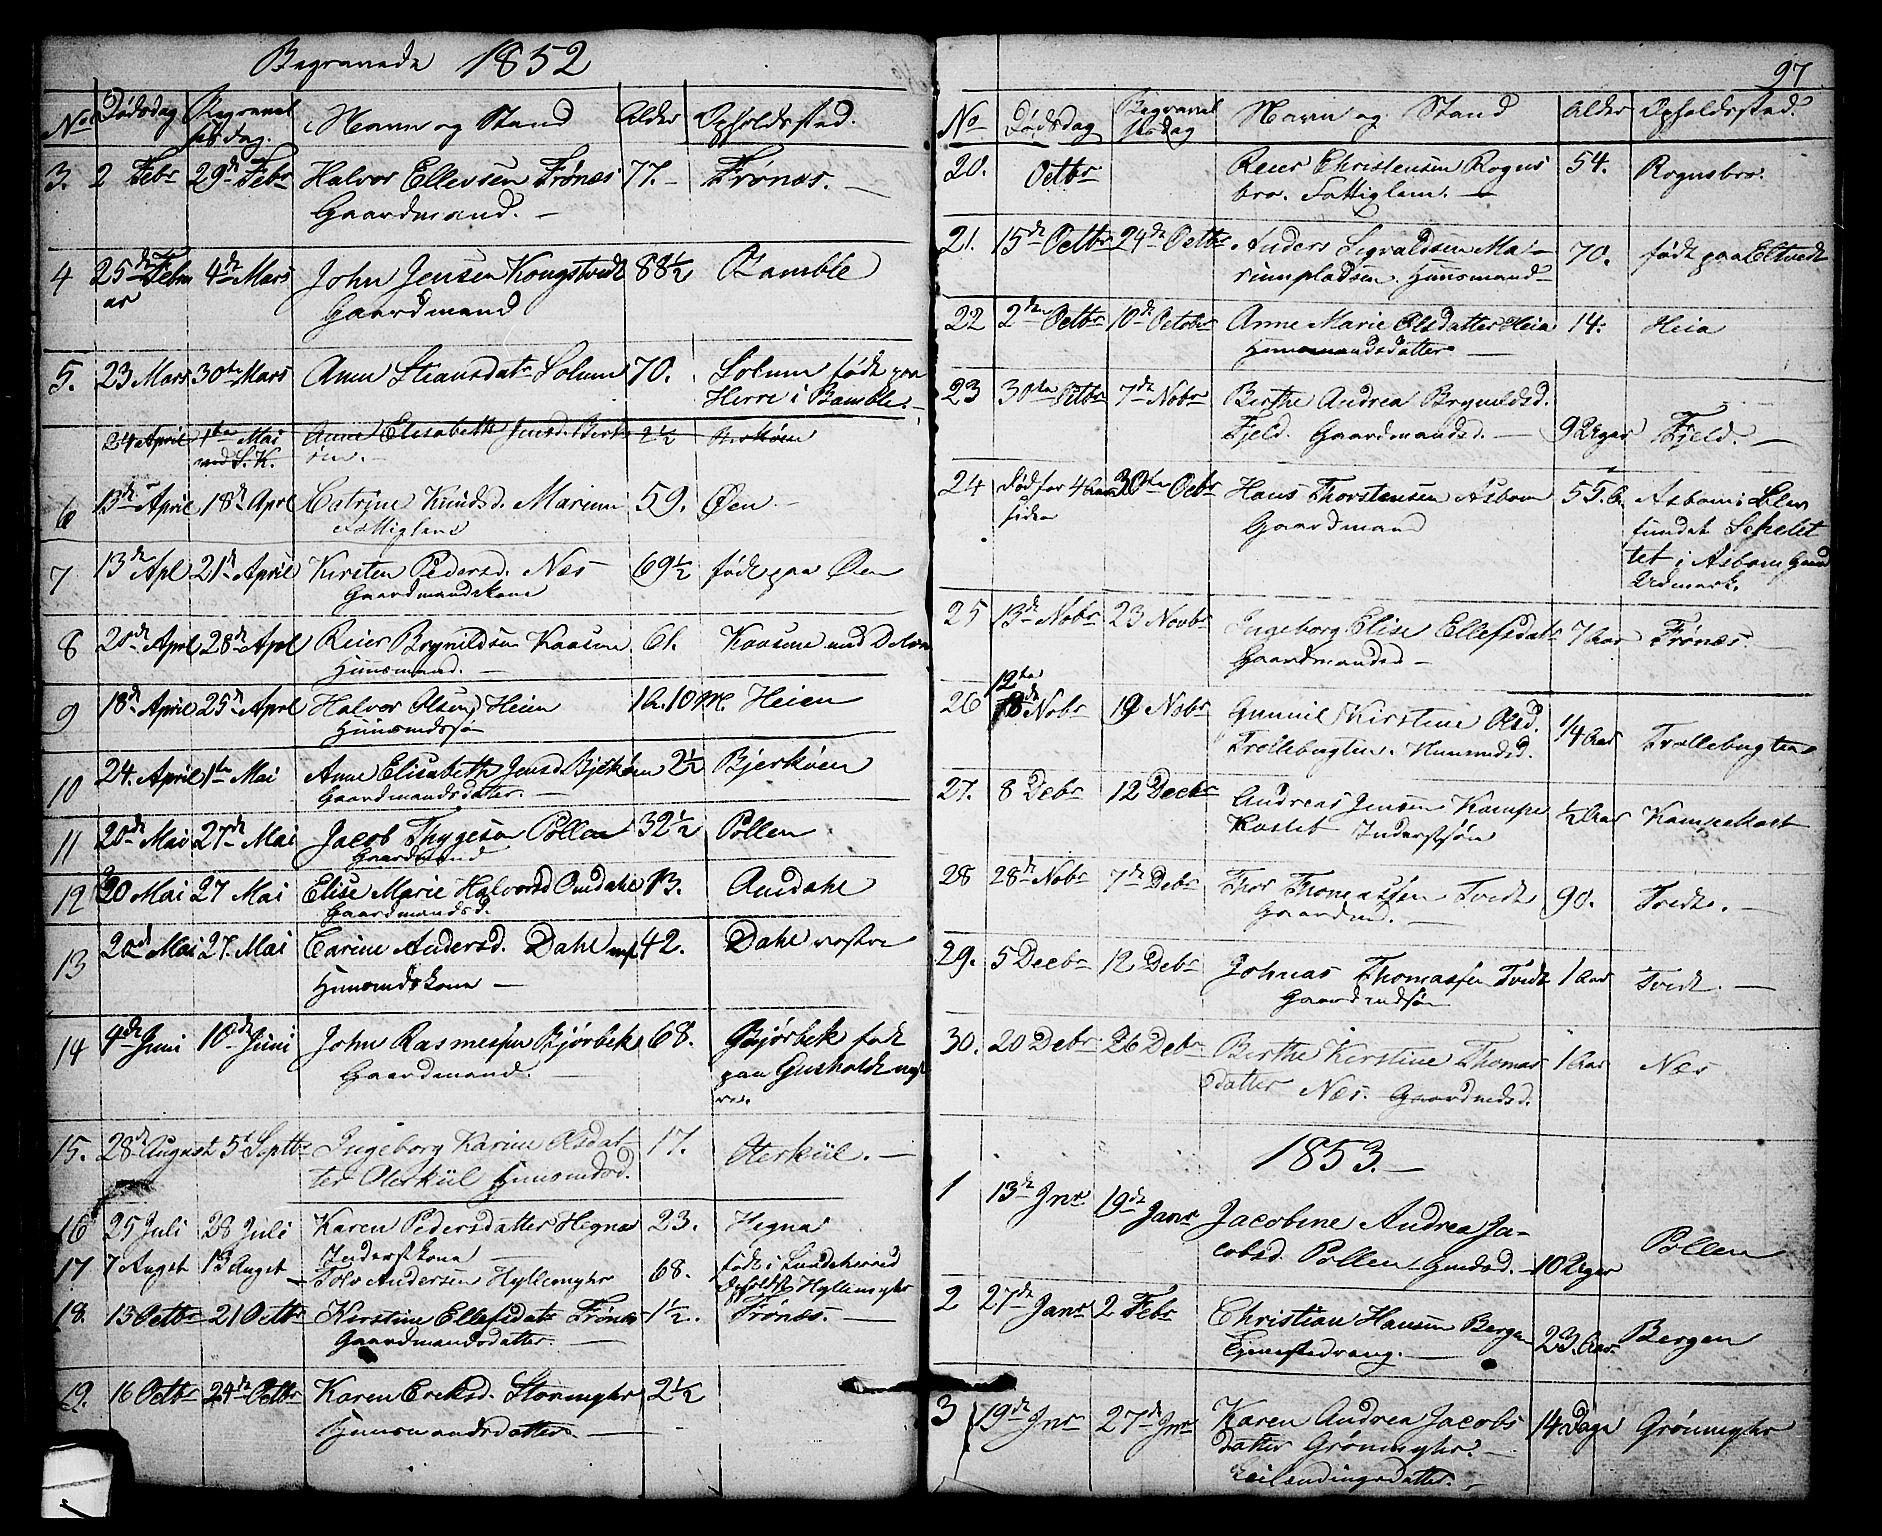 SAKO, Solum kirkebøker, G/Gb/L0001: Klokkerbok nr. II 1, 1848-1859, s. 97